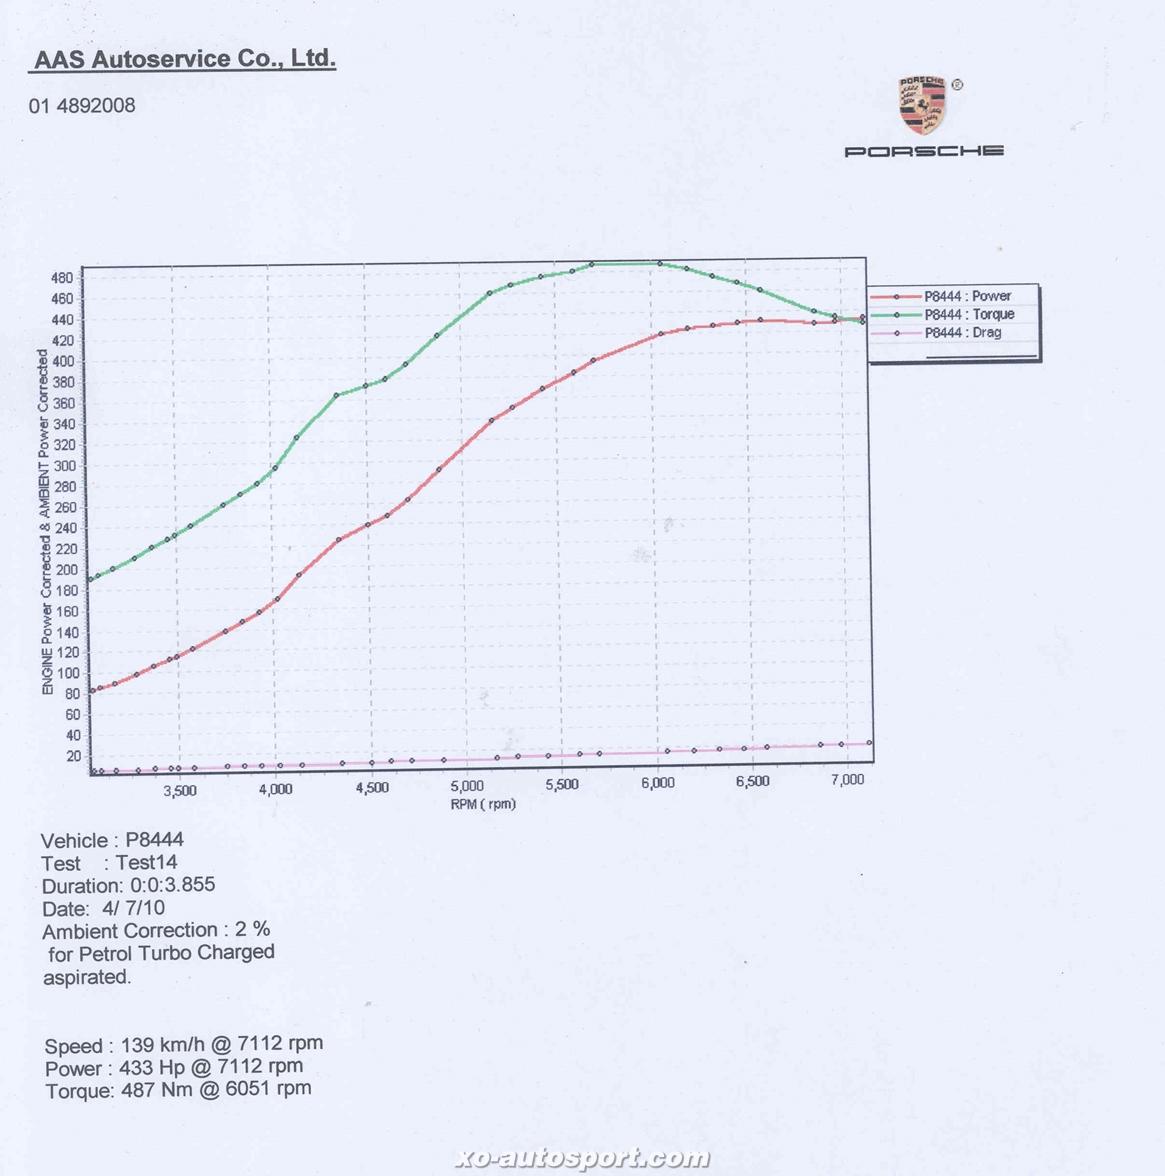 CA18_Toon_Engine_Dyno CA18 Toon Engine